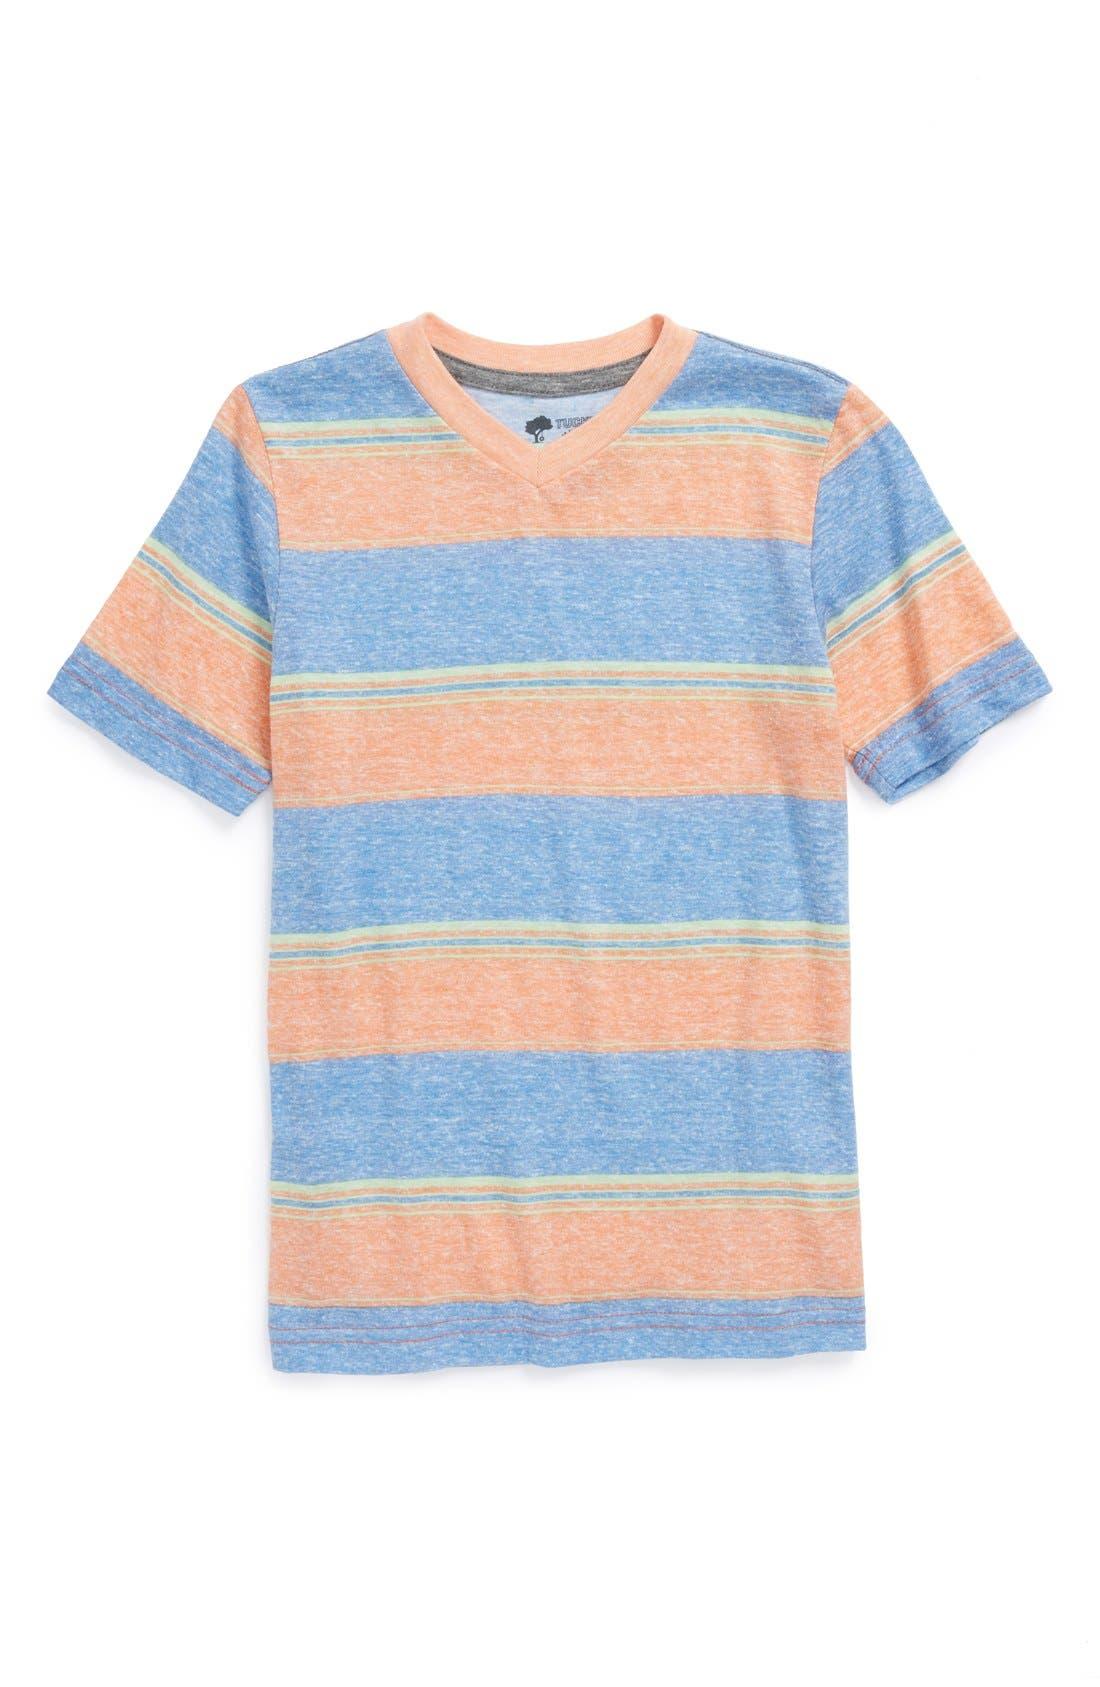 Main Image - Tucker + Tate 'Wallace' V-Neck T-Shirt (Toddler Boys)